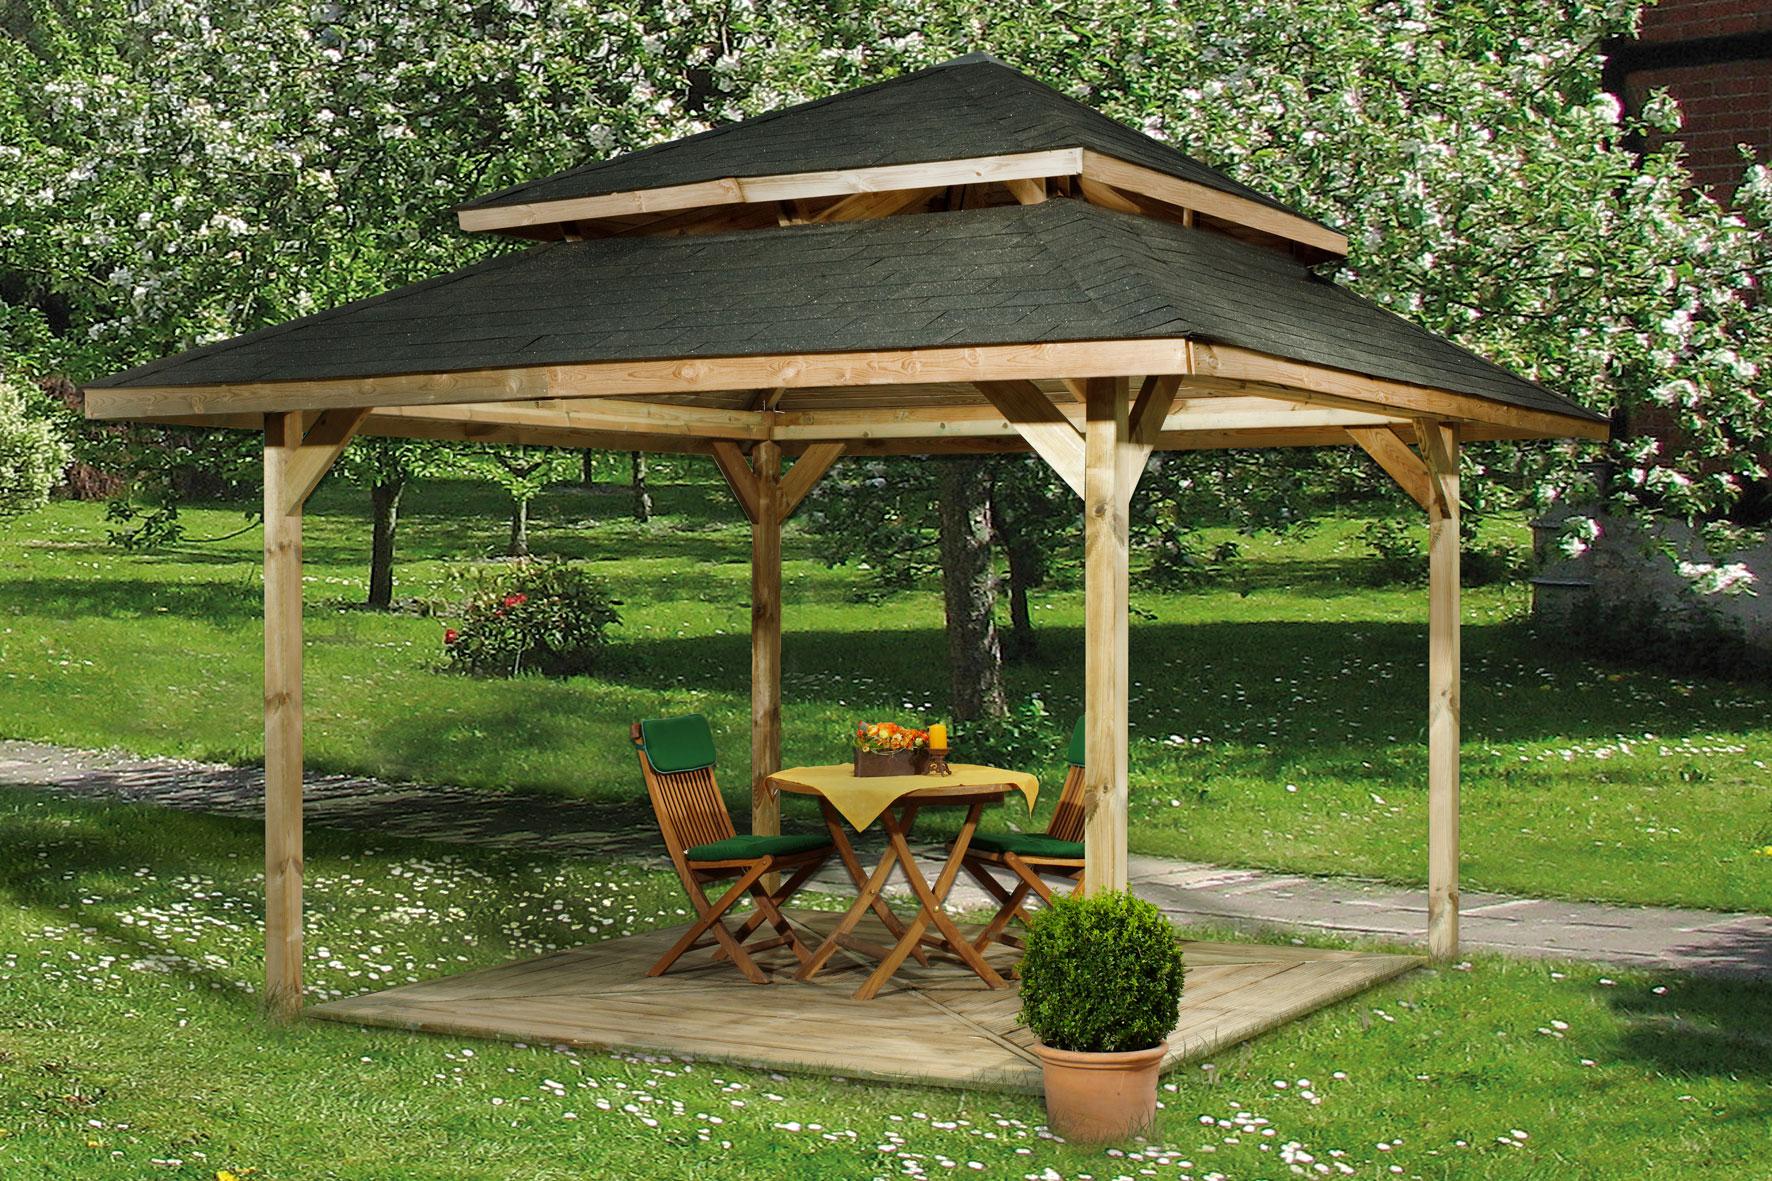 pavillon aus holz angebot karibu set perida inkl und with. Black Bedroom Furniture Sets. Home Design Ideas